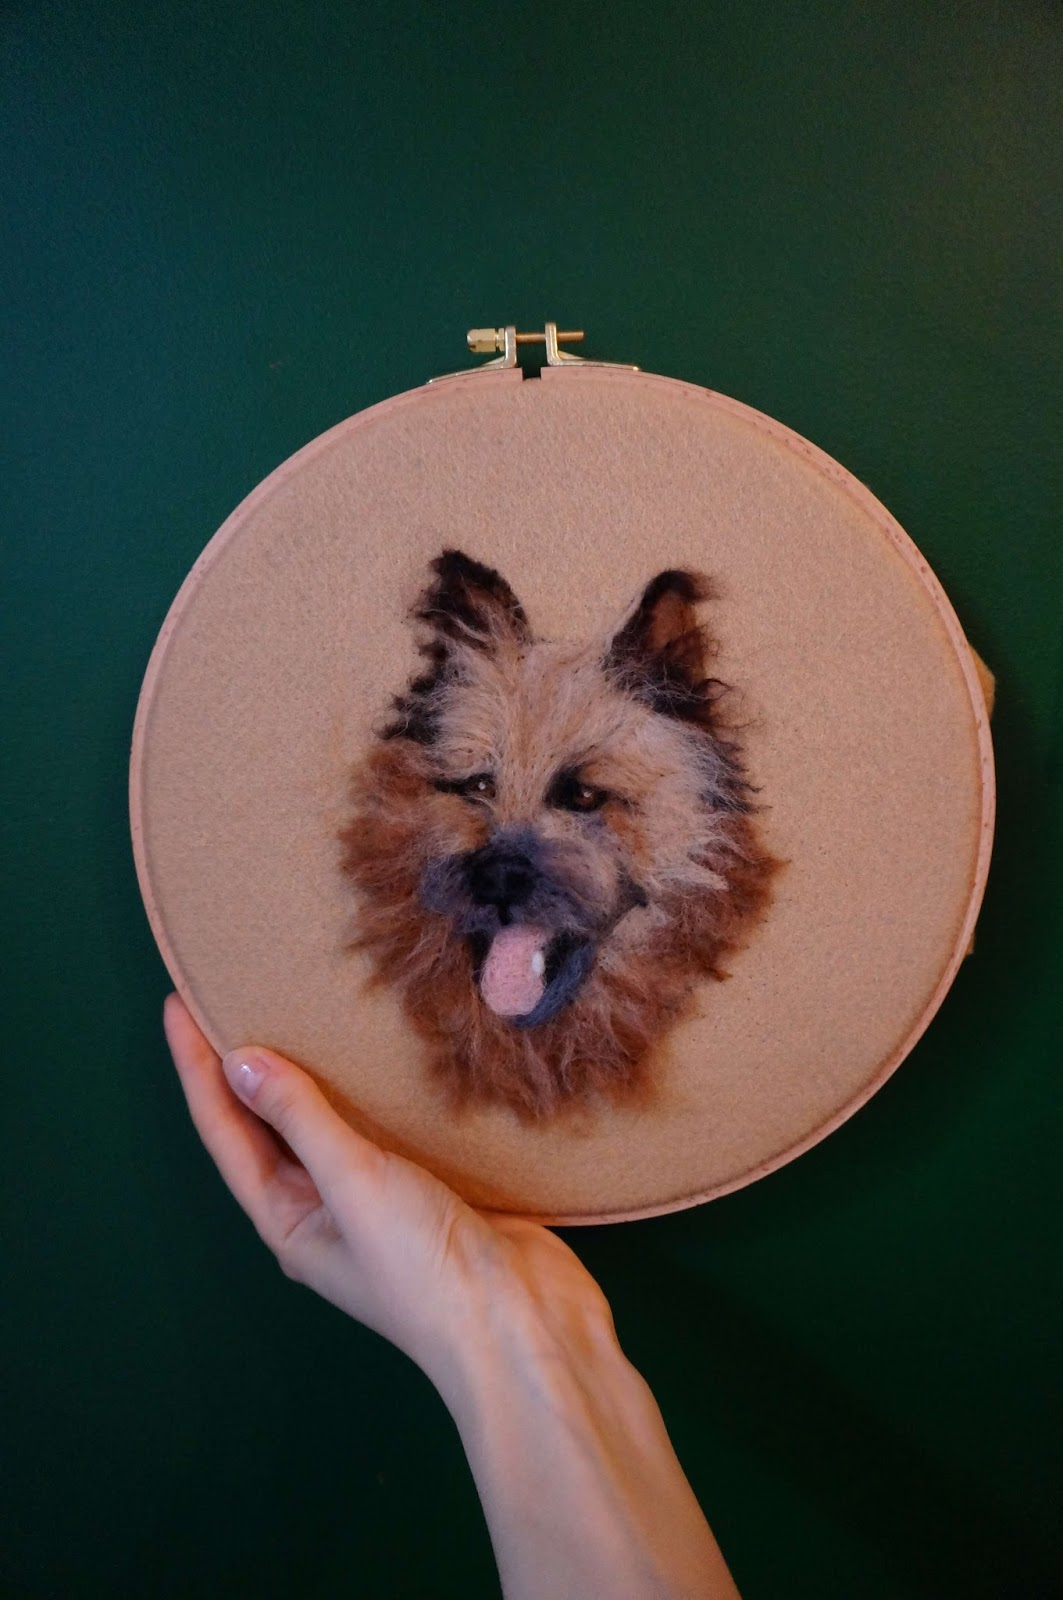 Portret psa filcowany na płasko